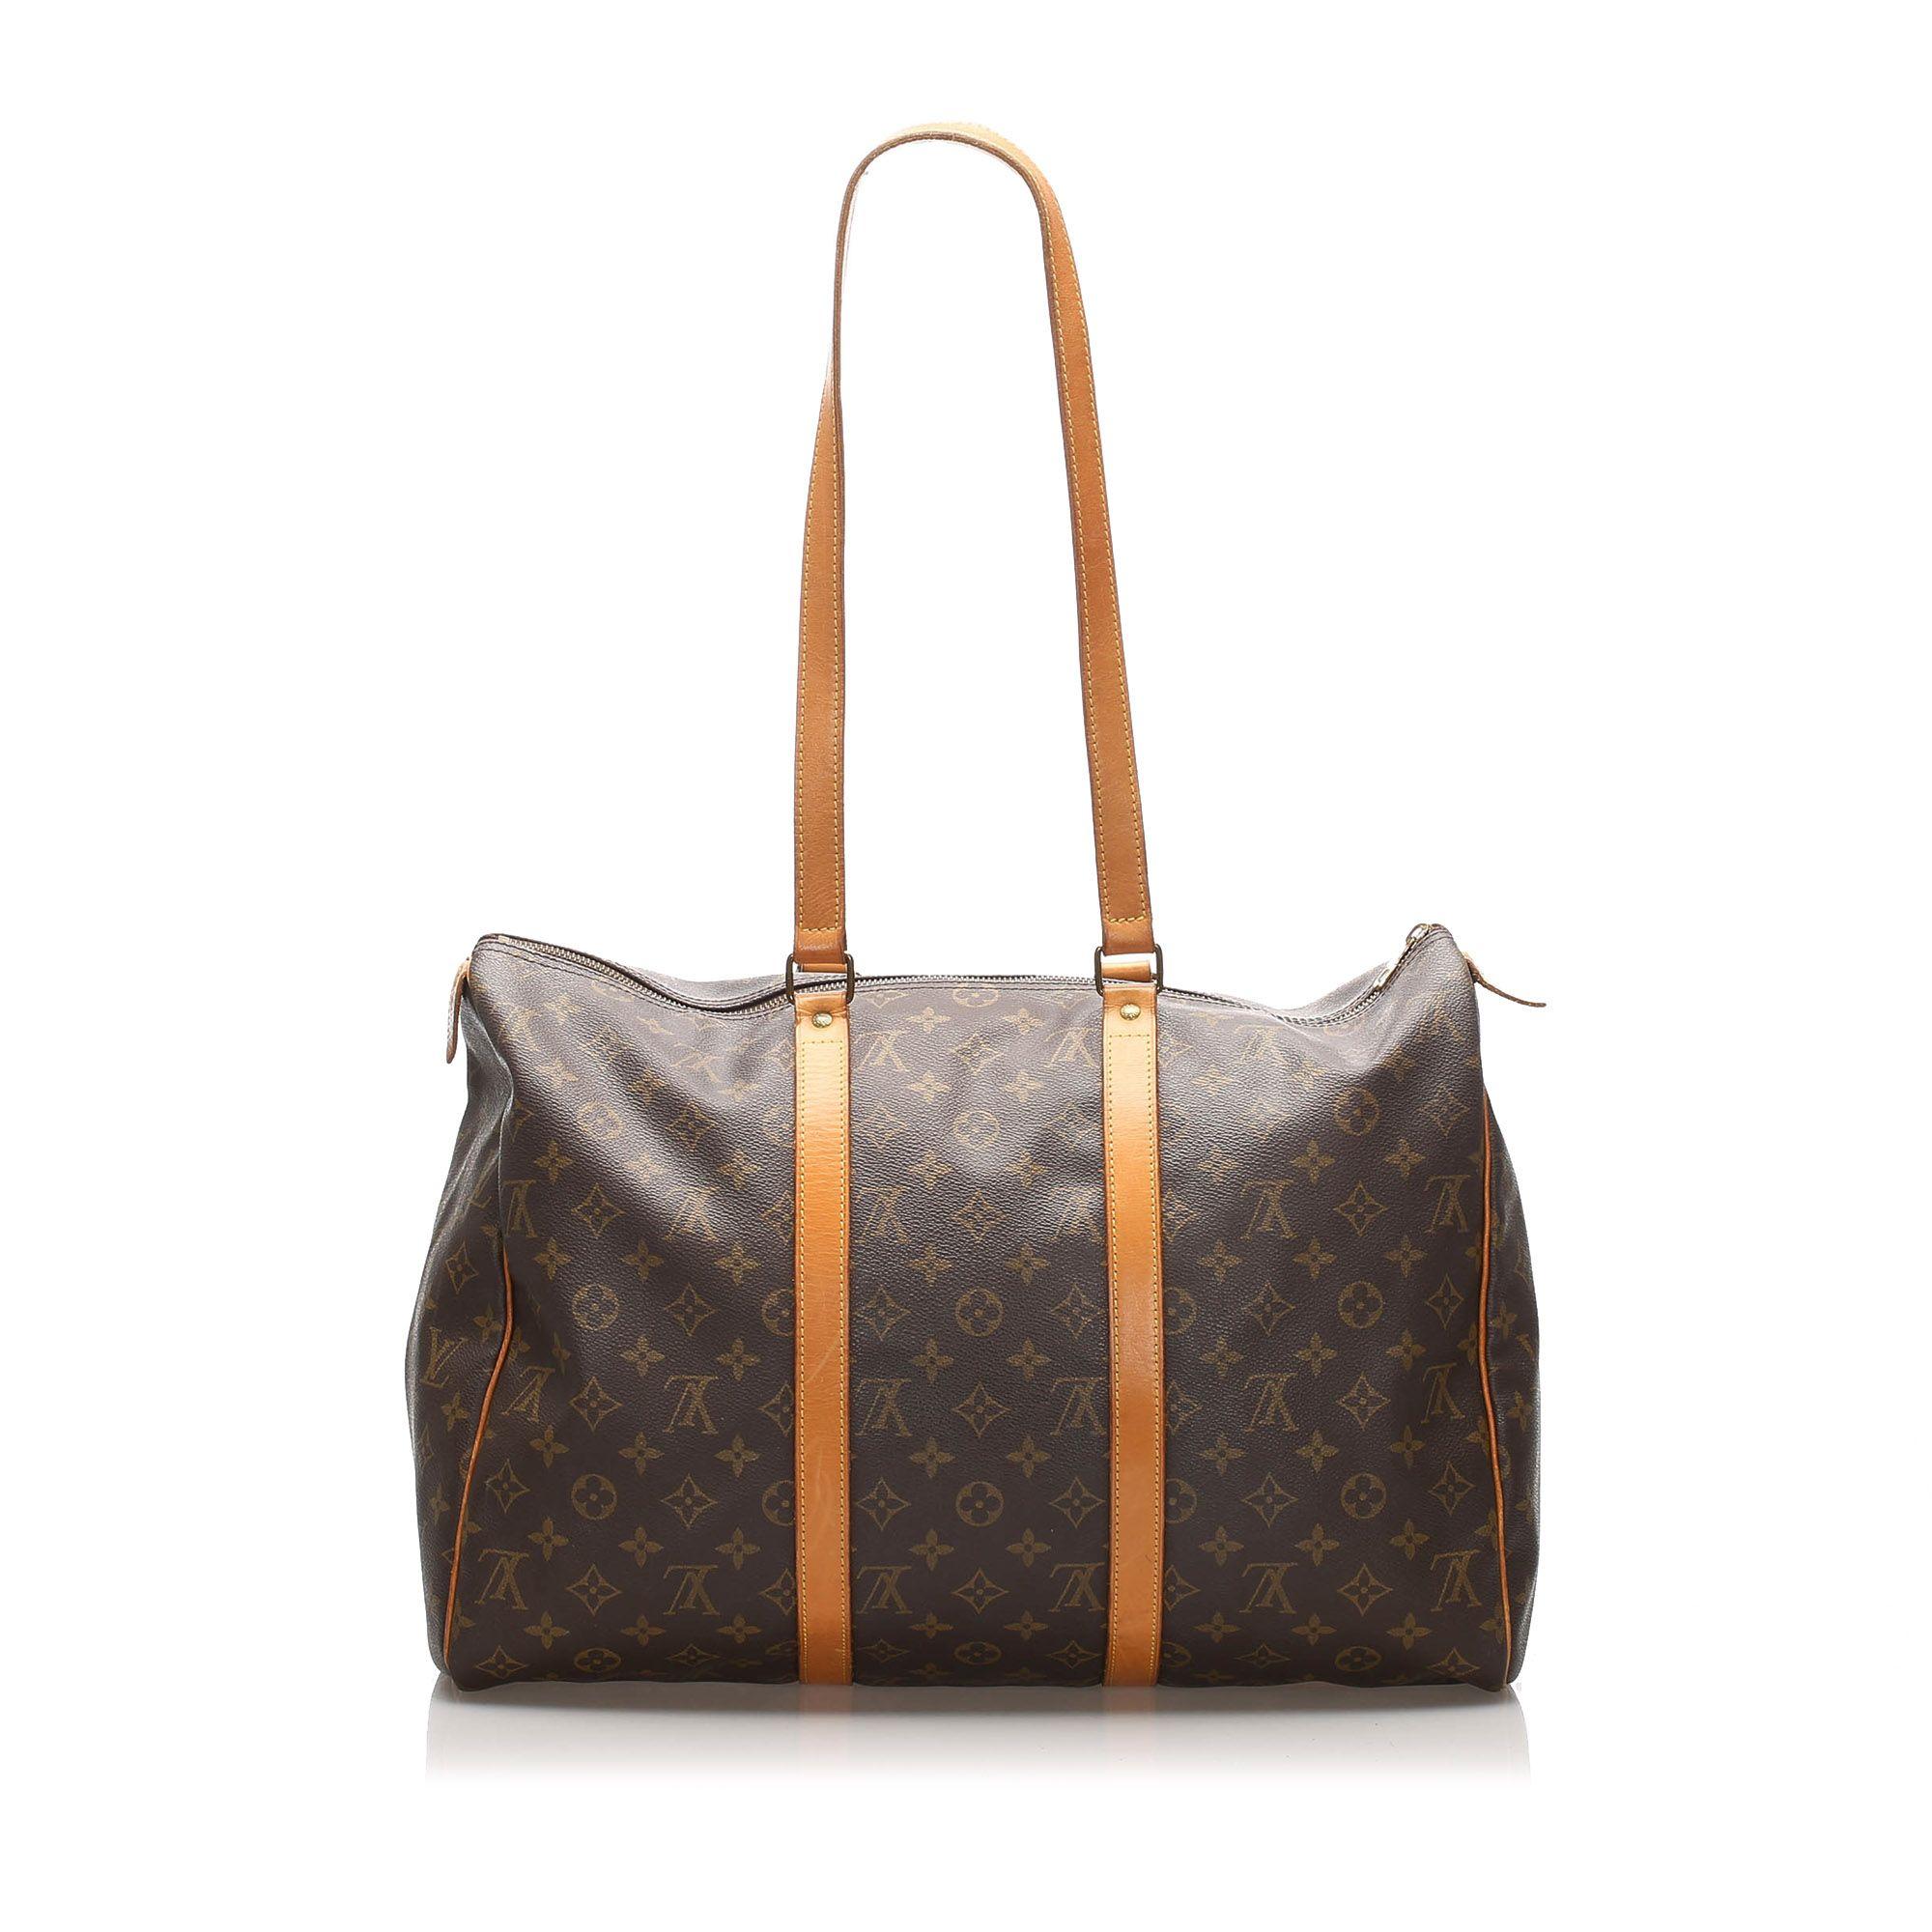 Vintage Louis Vuitton Monogram Sac Flanerie 45 Brown